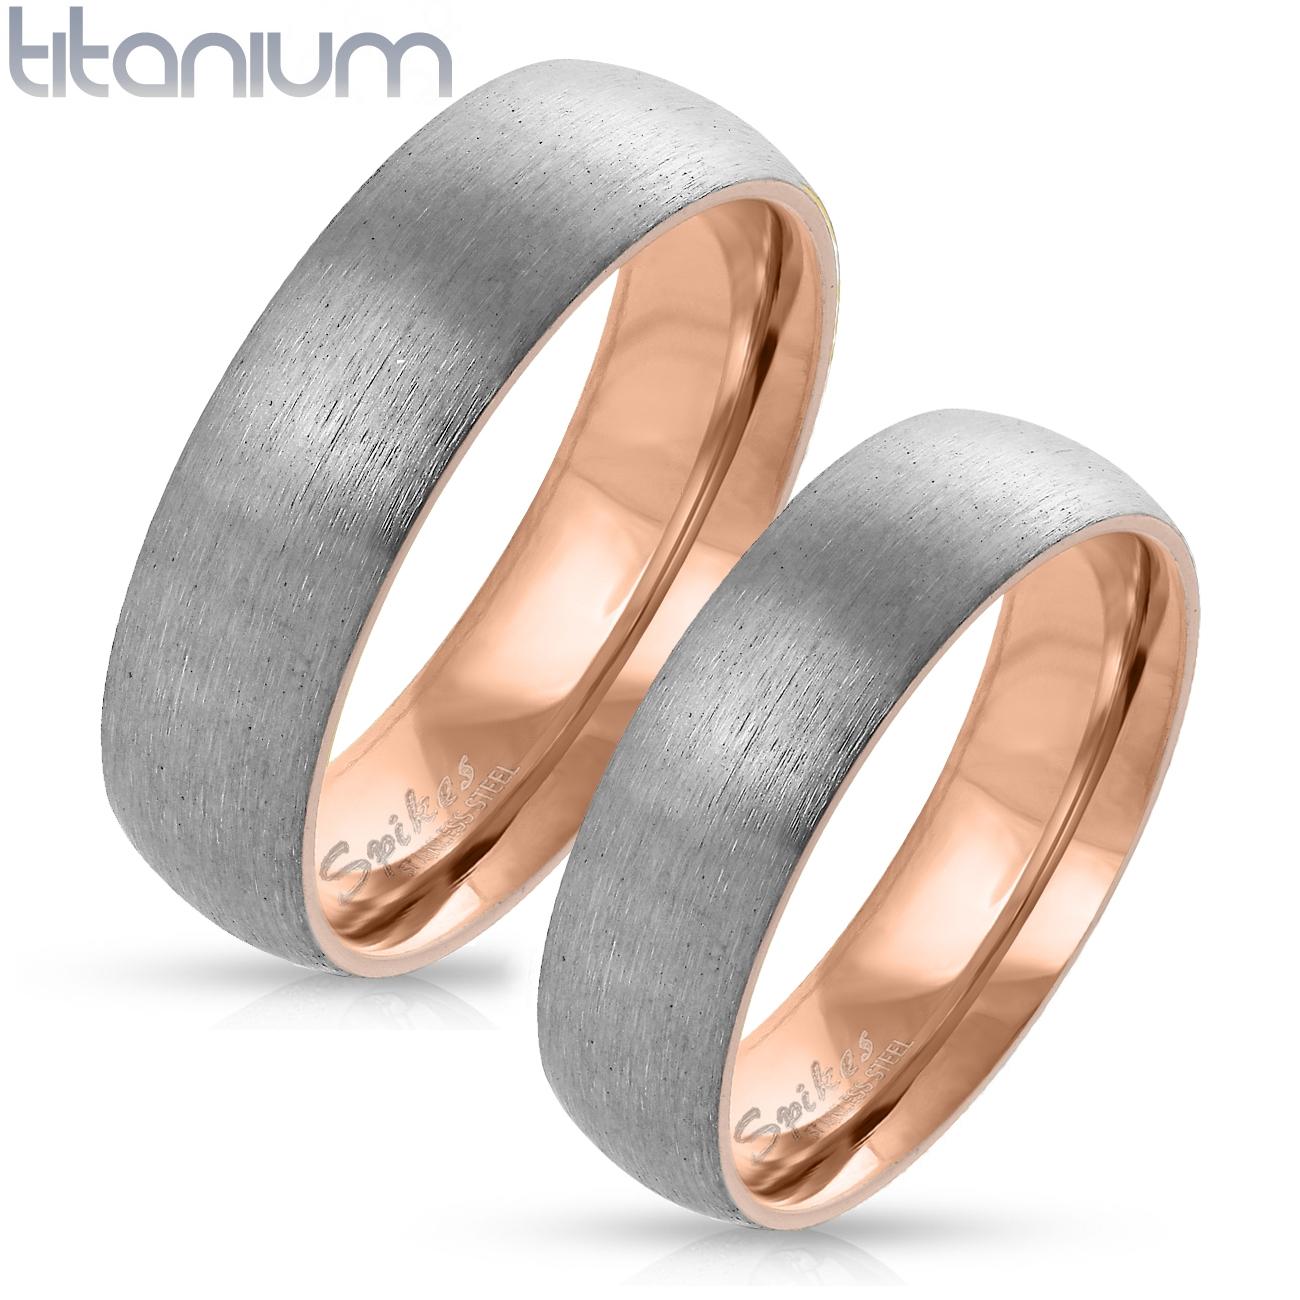 Tt1041 Snubni Prsteny Z Titanu Par Snubniprsteny4u Cz